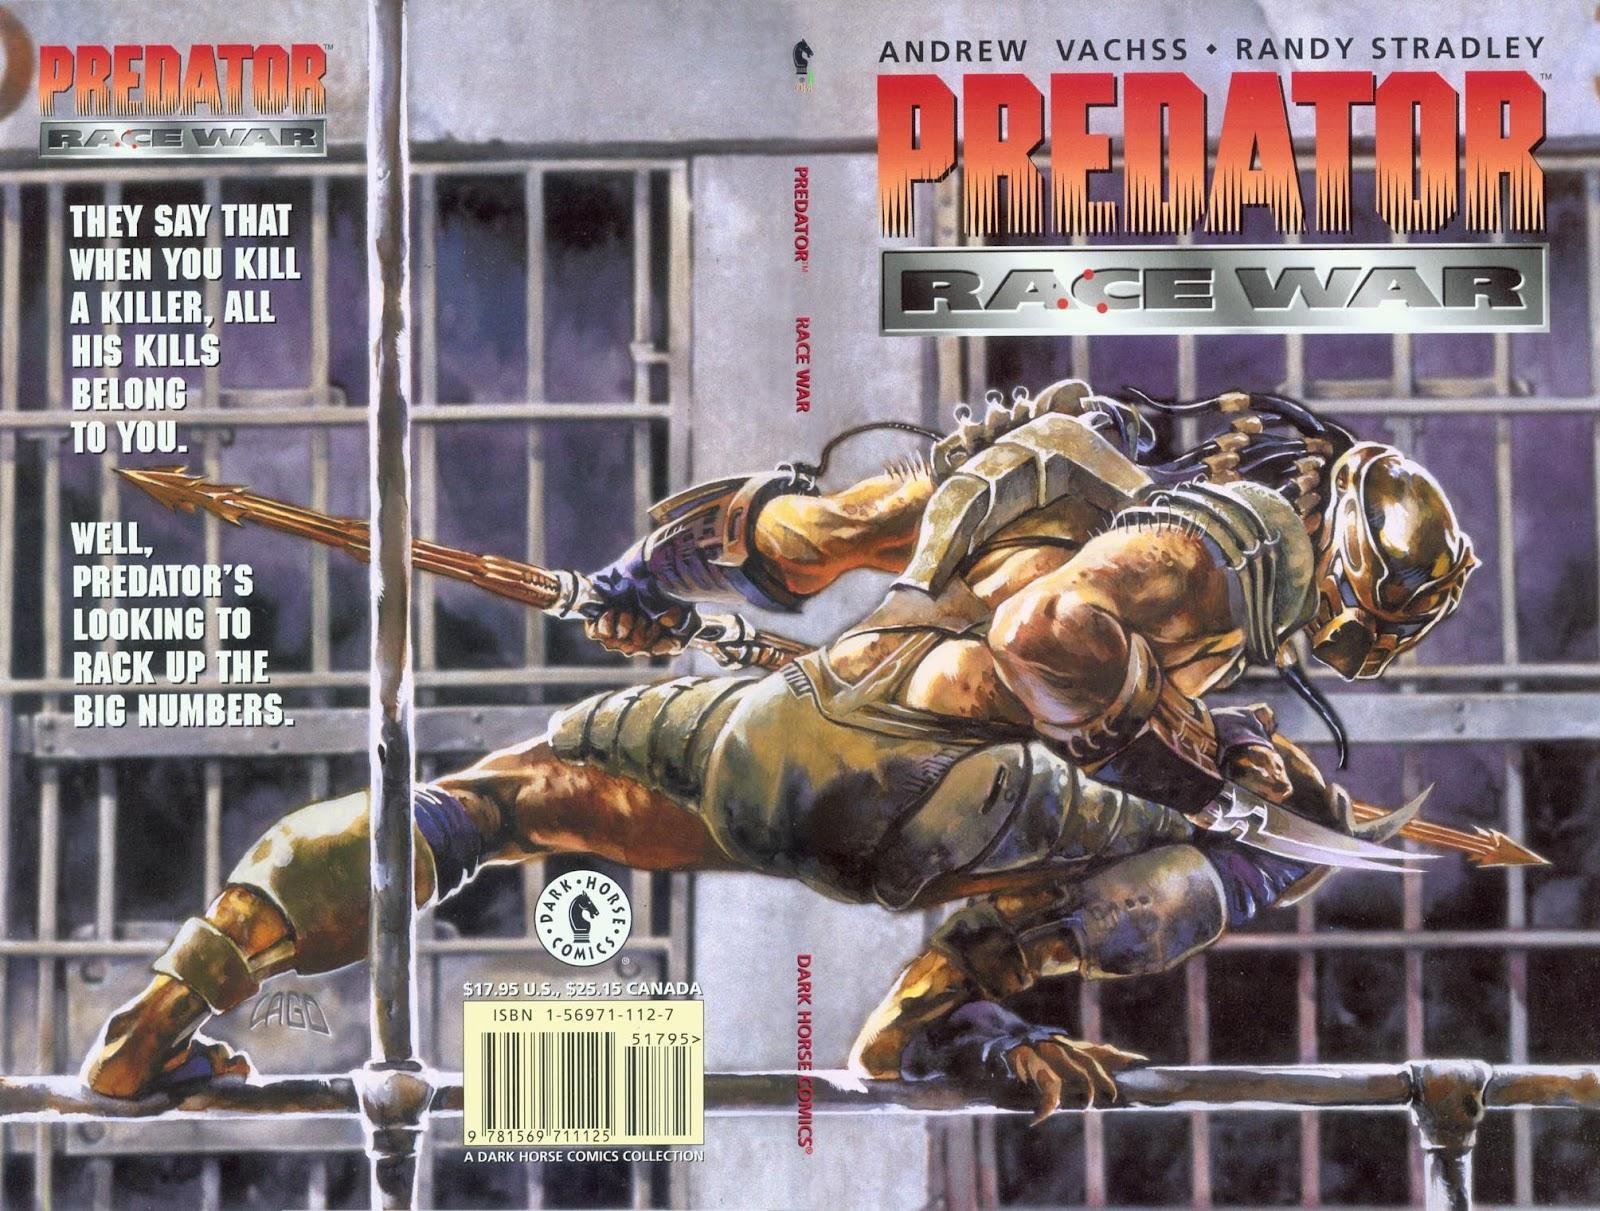 Predator: Race War TPB Page 1